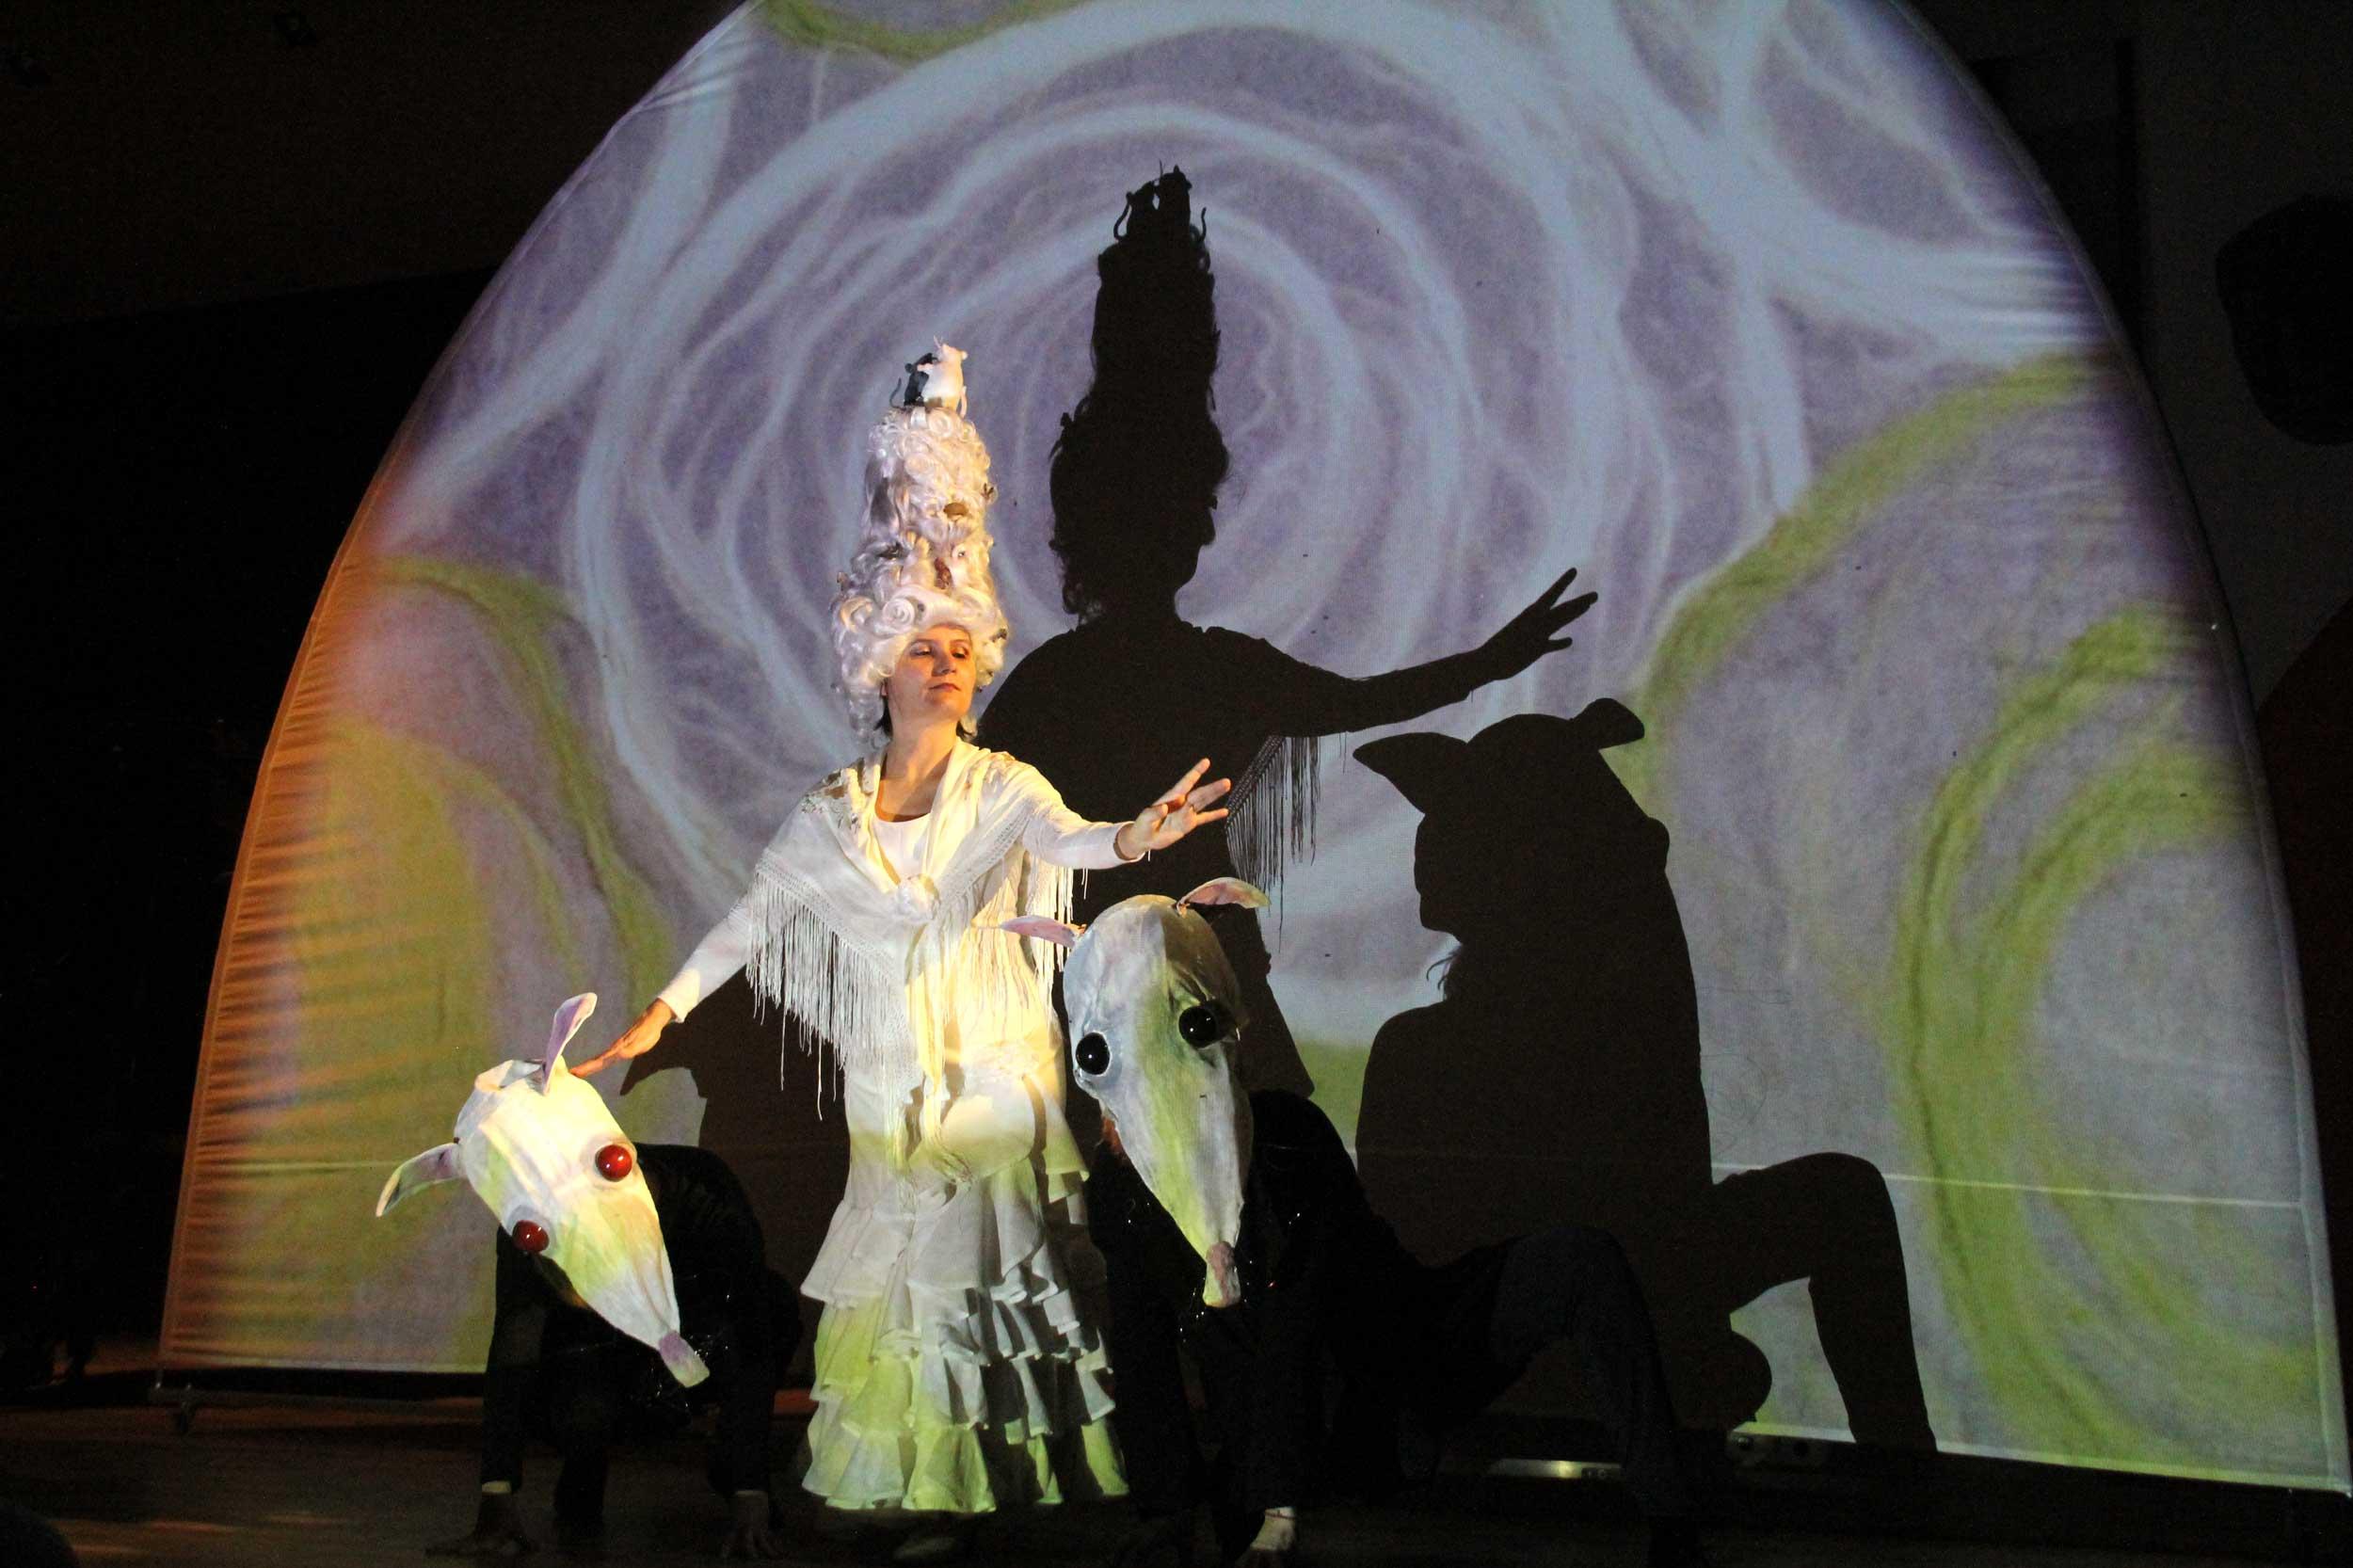 isaac-albeniz-iberia-visual-theatre-figurentheater-IMG_3105.jpg